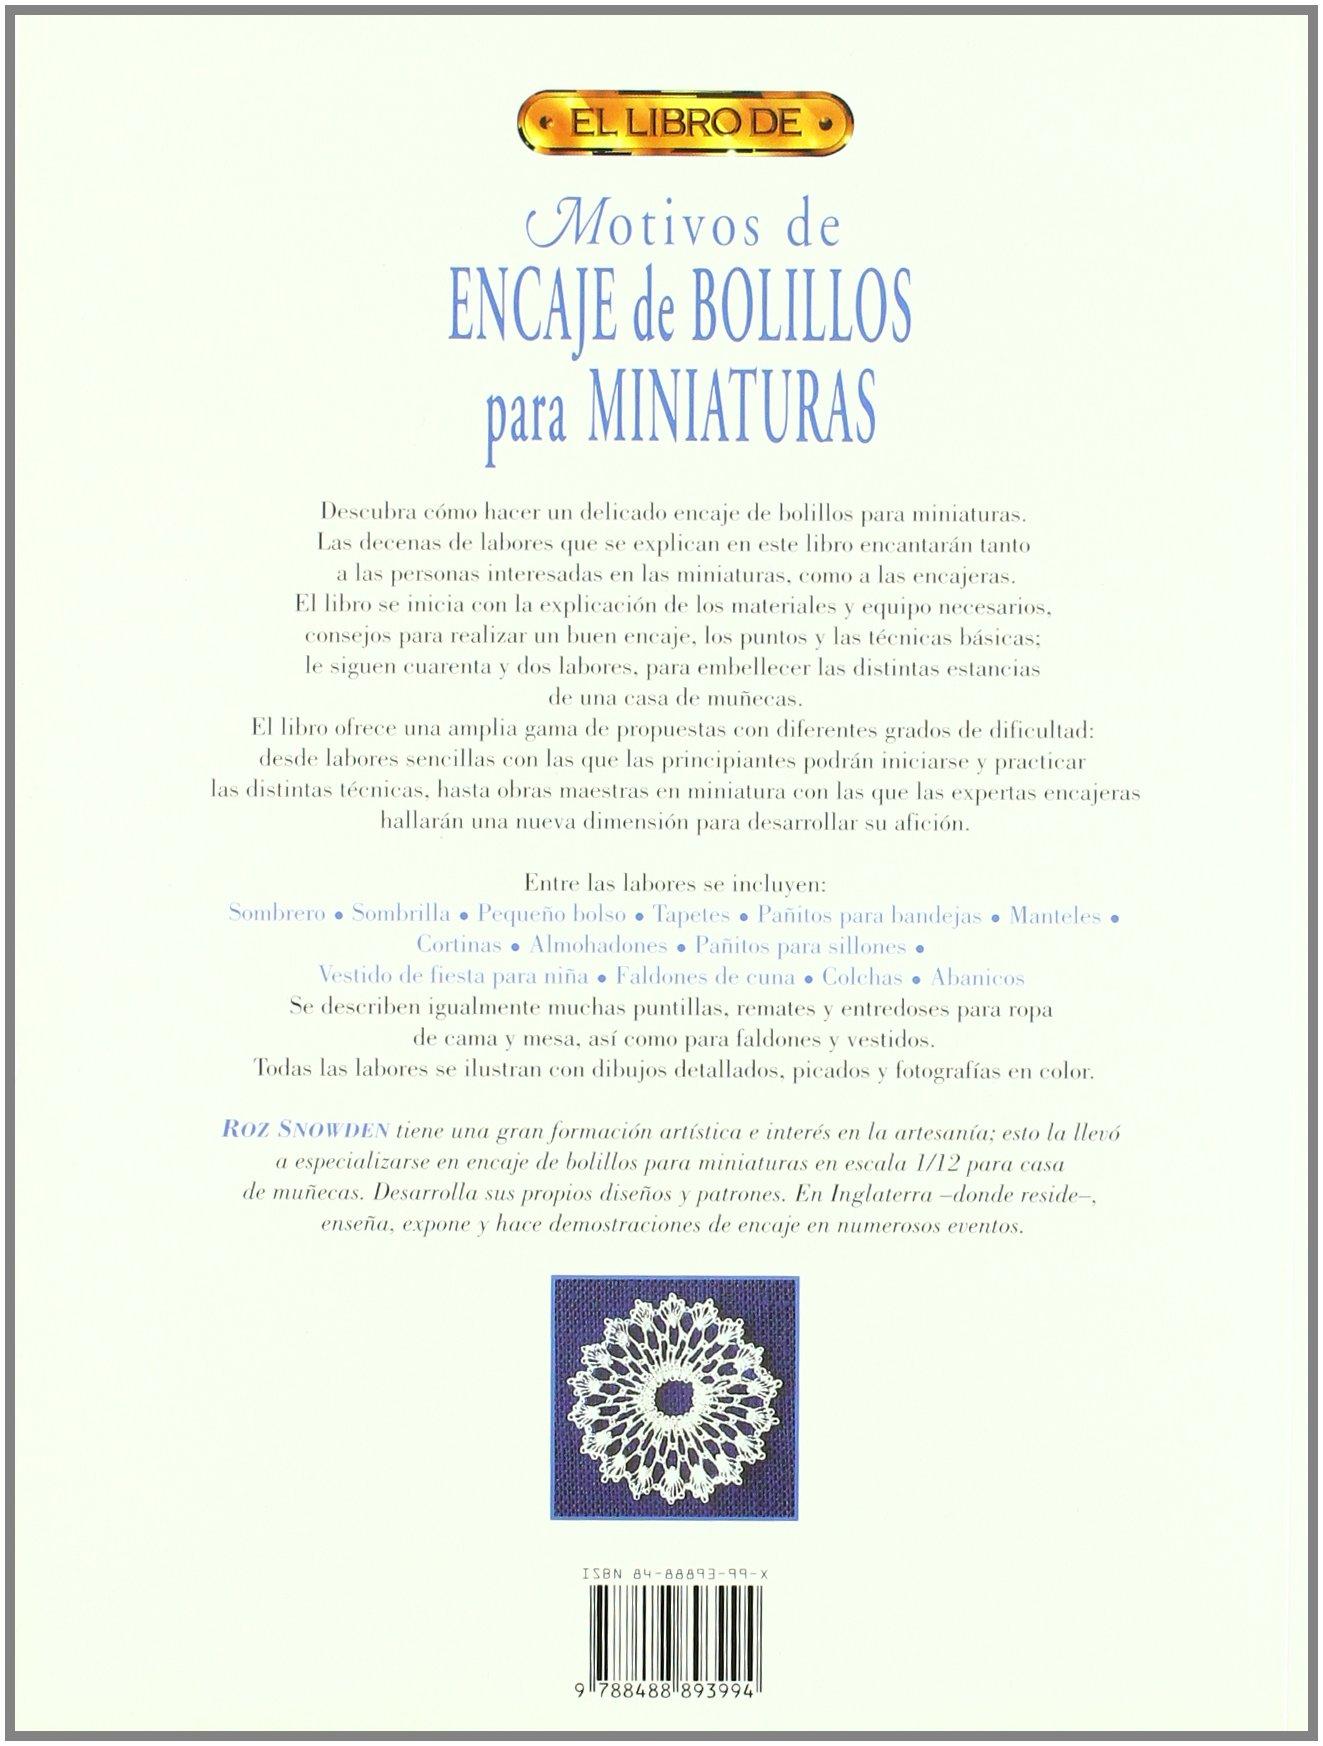 Motivos de Encaje de Bolillos Para Miniaturas - El Libro de (Spanish Edition): Roz Snowden: 9788488893994: Amazon.com: Books